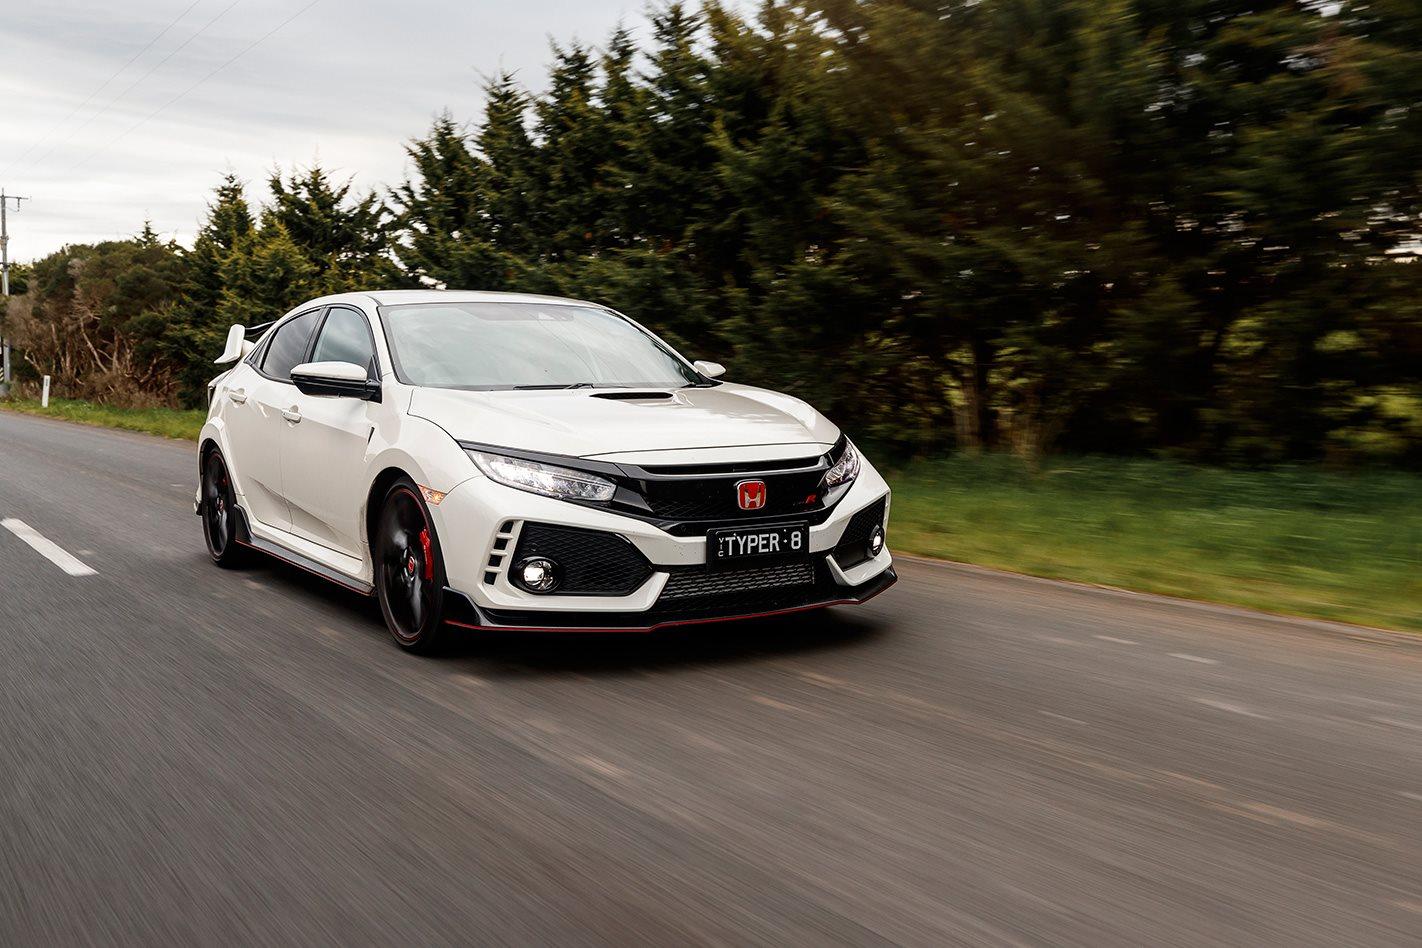 Honda Civic Type R driving.jpg